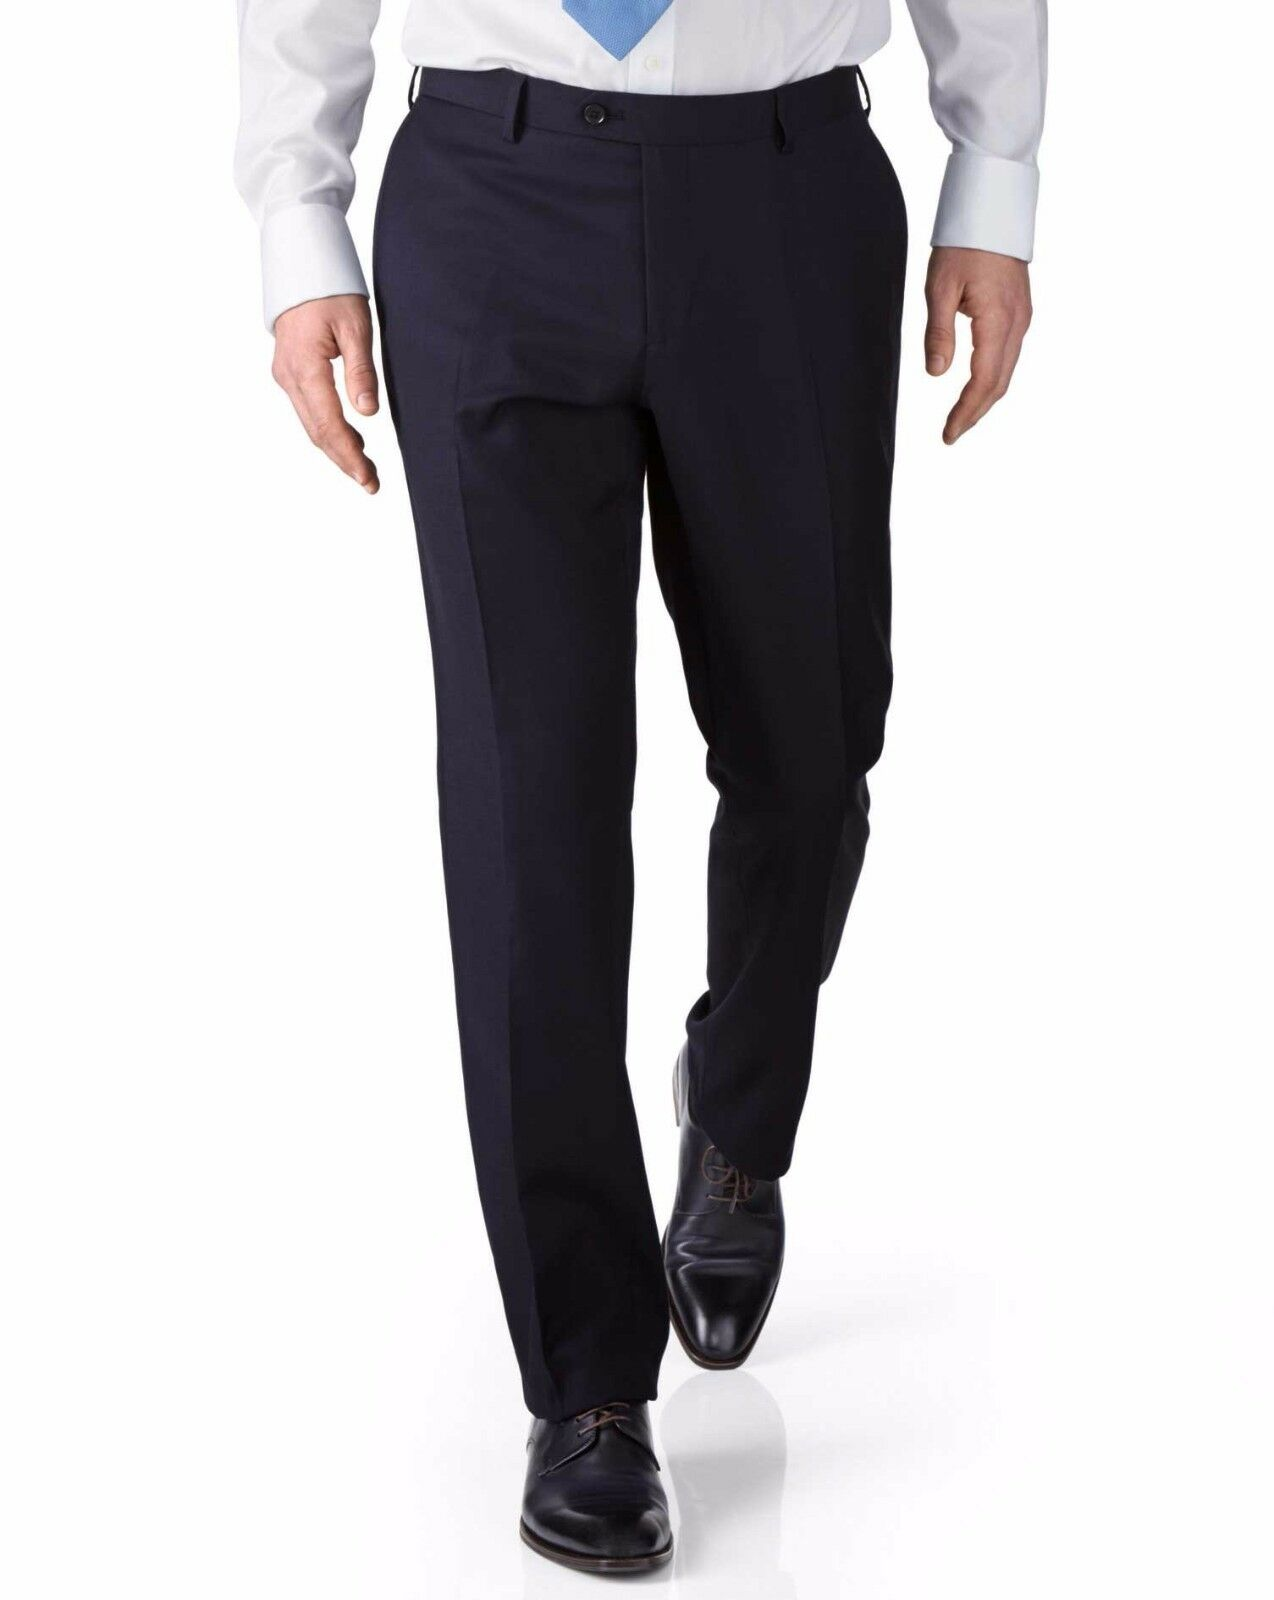 Charles Tyrwhitt Navy Slim Fit Twill Geschäft Suit Trousers W30 L32 TD171 TT 04